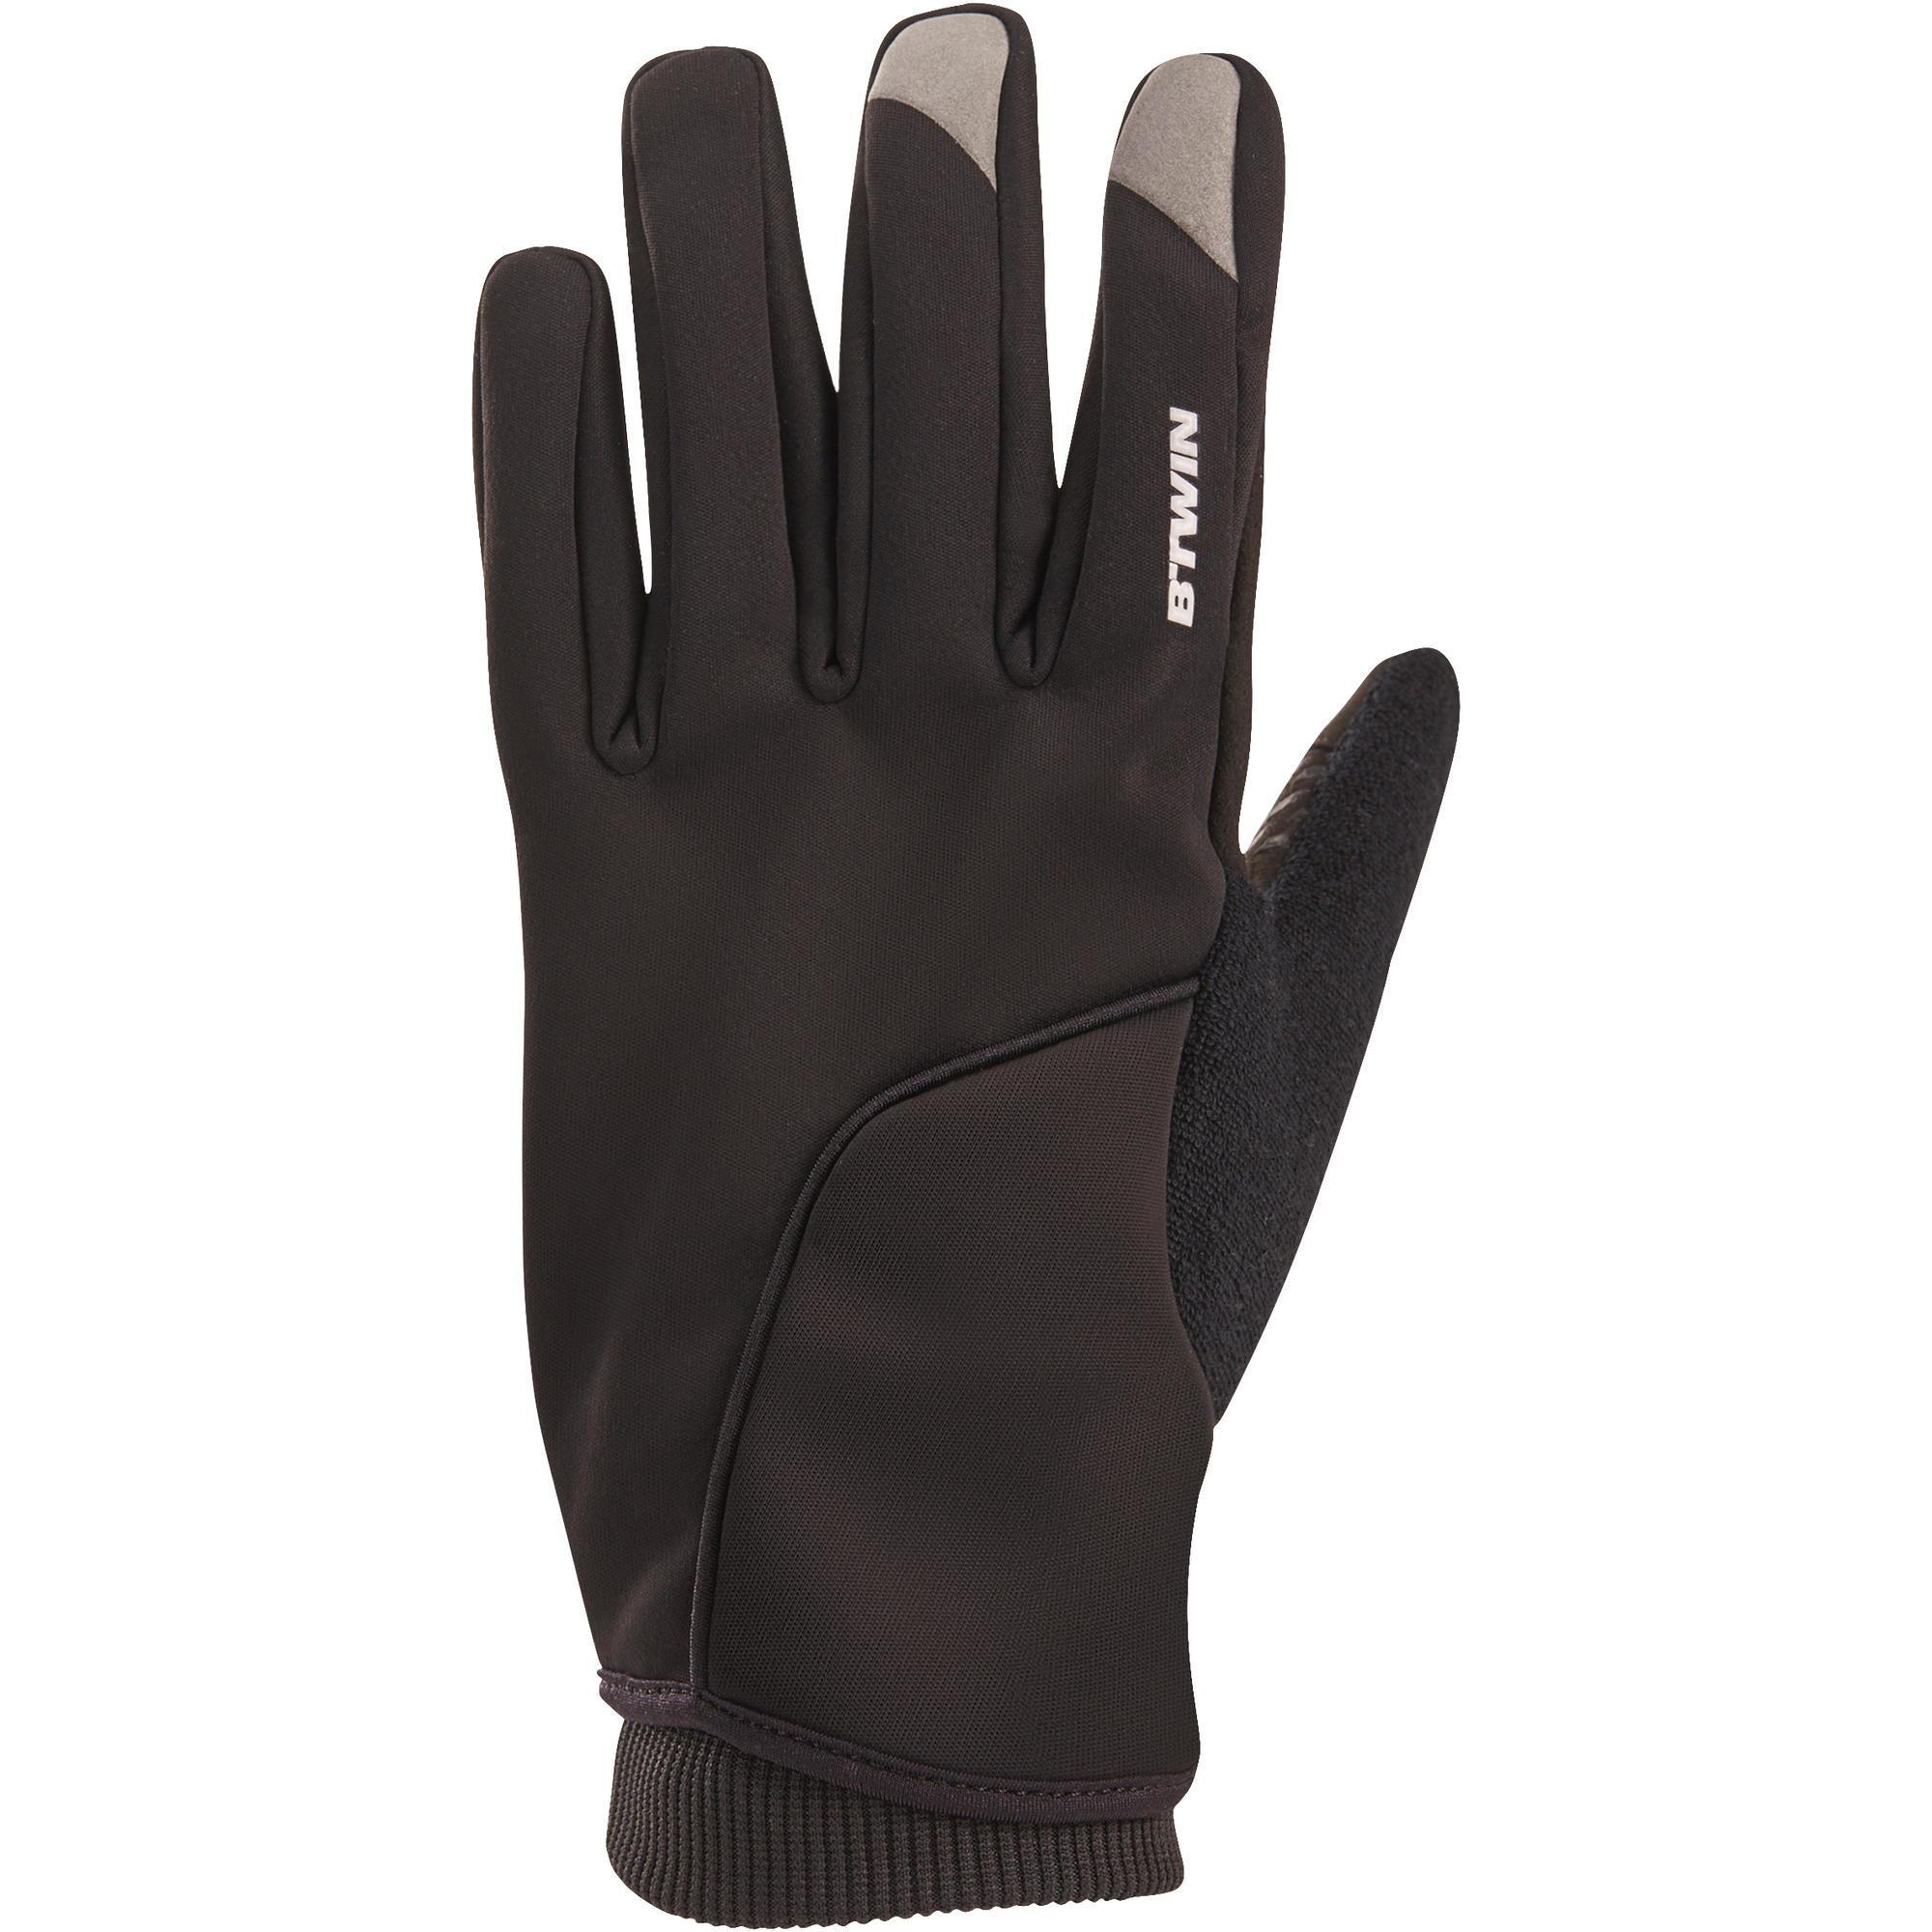 Fahrradhandschuhe 500 kühles Wetter | Accessoires > Handschuhe > Sonstige Handschuhe | Triban